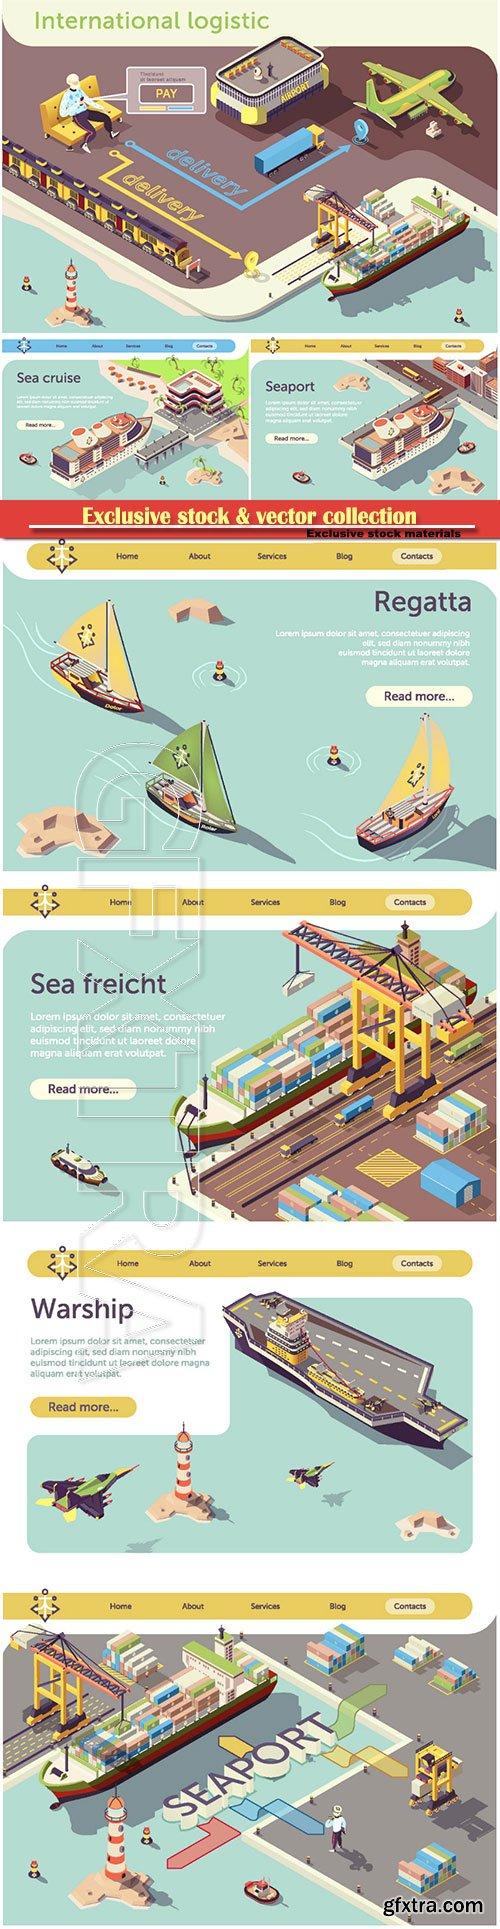 Online International Logistic Infographic Banner